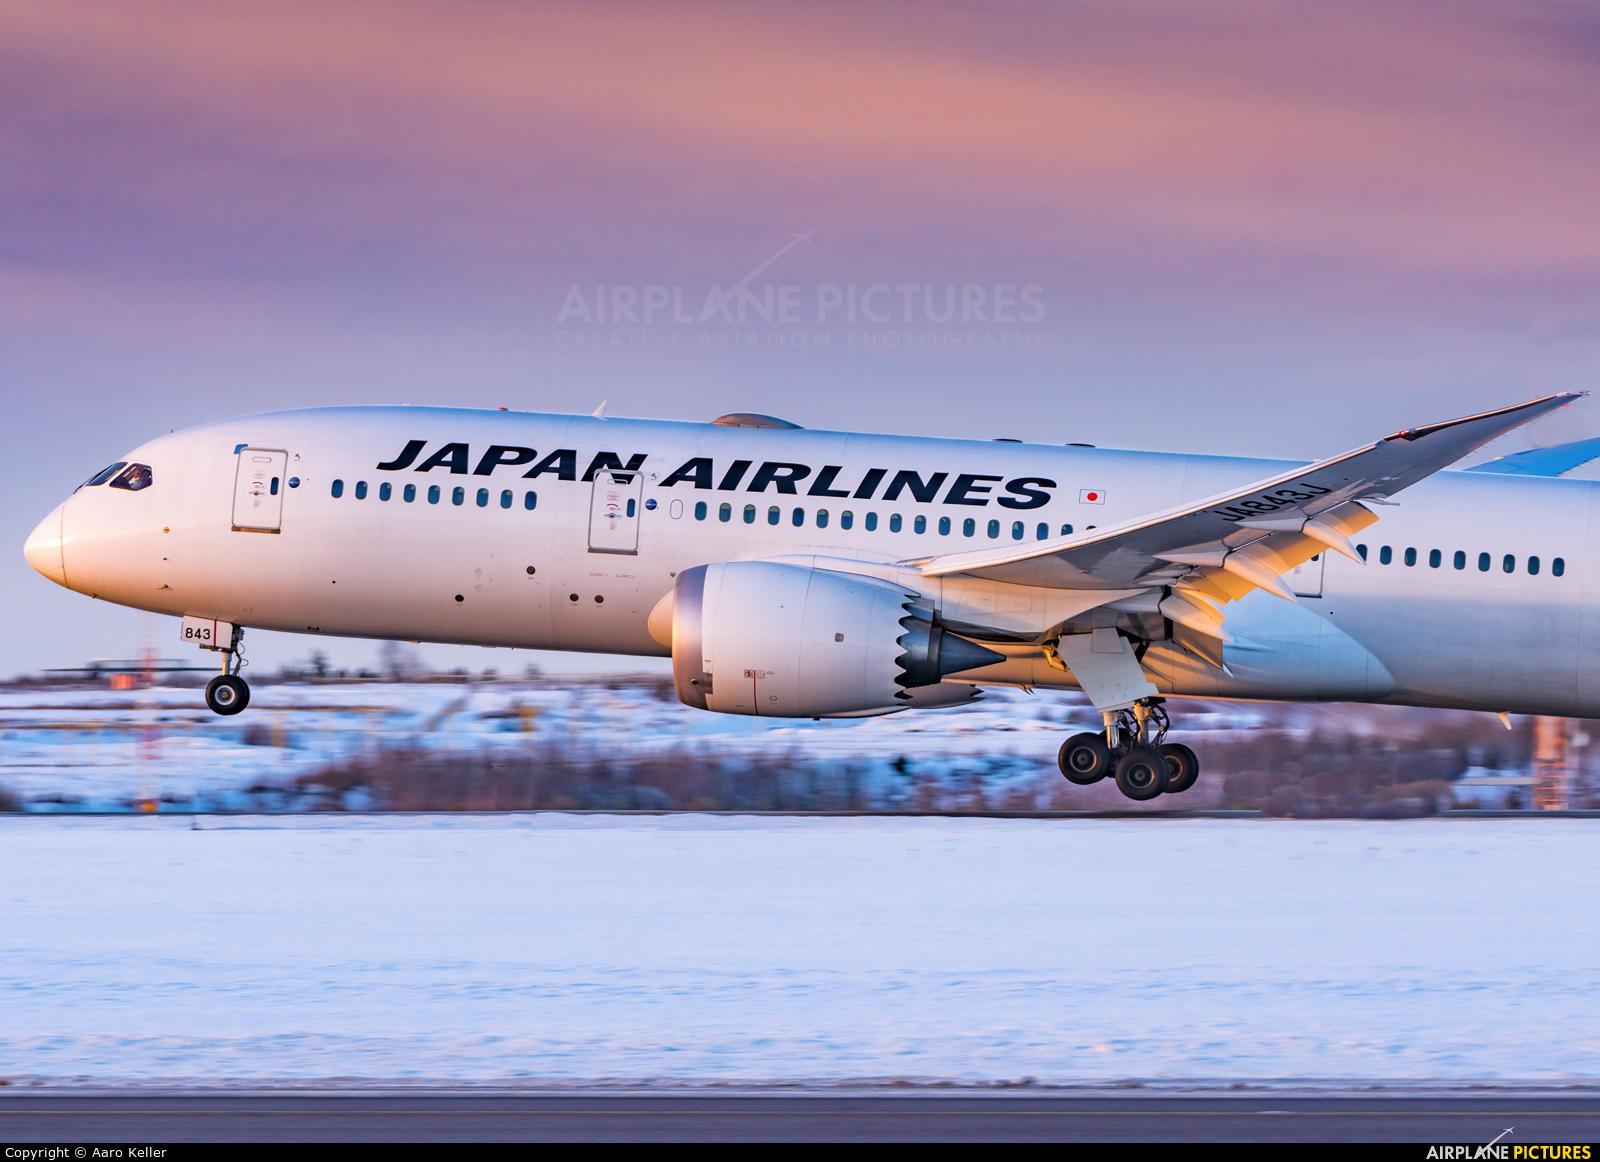 JAL - Japan Airlines JA843J aircraft at Helsinki - Vantaa